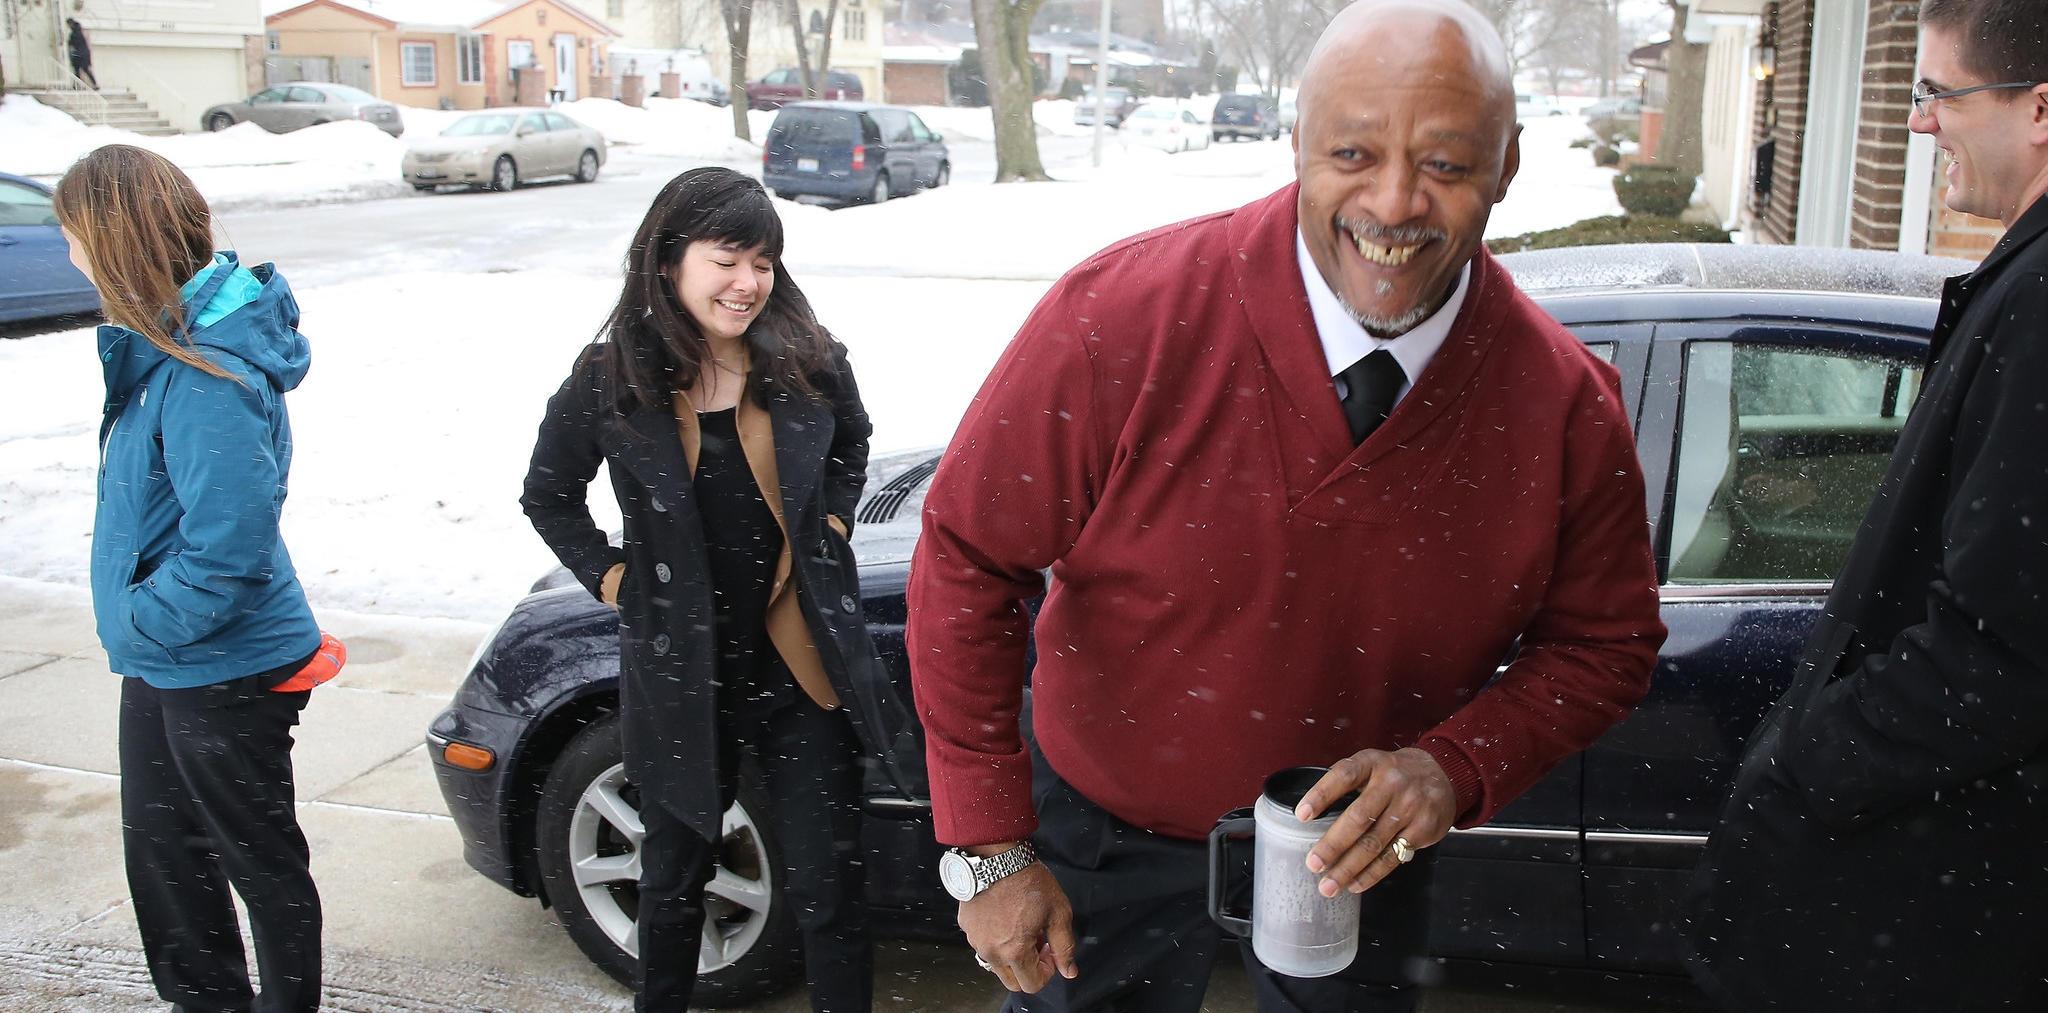 Getting ready for court with exoneree Tyrone Hood. [Photo Courtesy of Antonio Perez, Chicago Tribune]